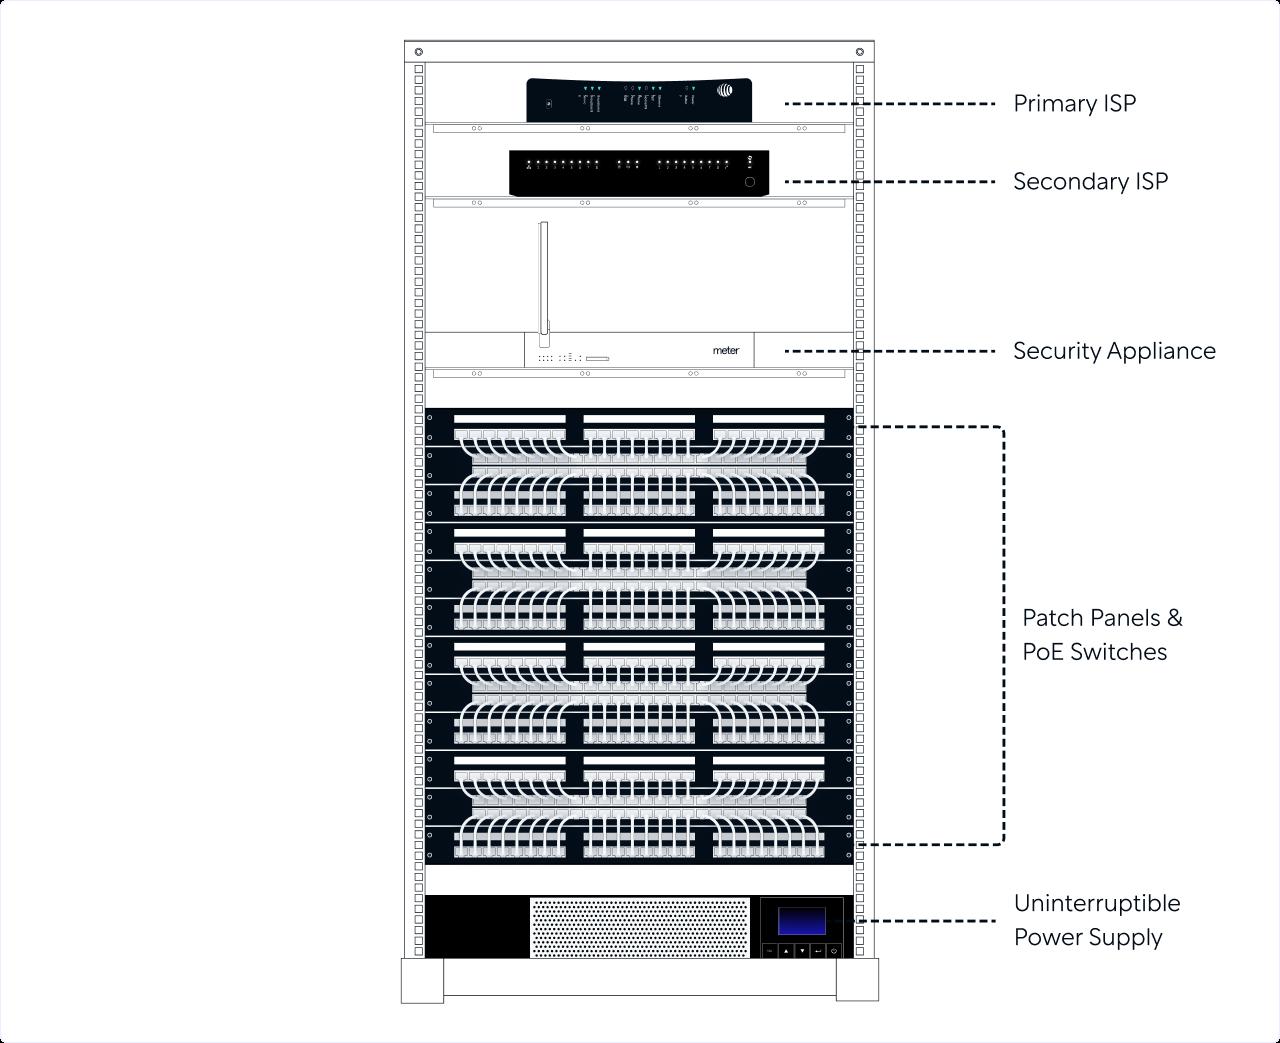 Designing a Network Rack